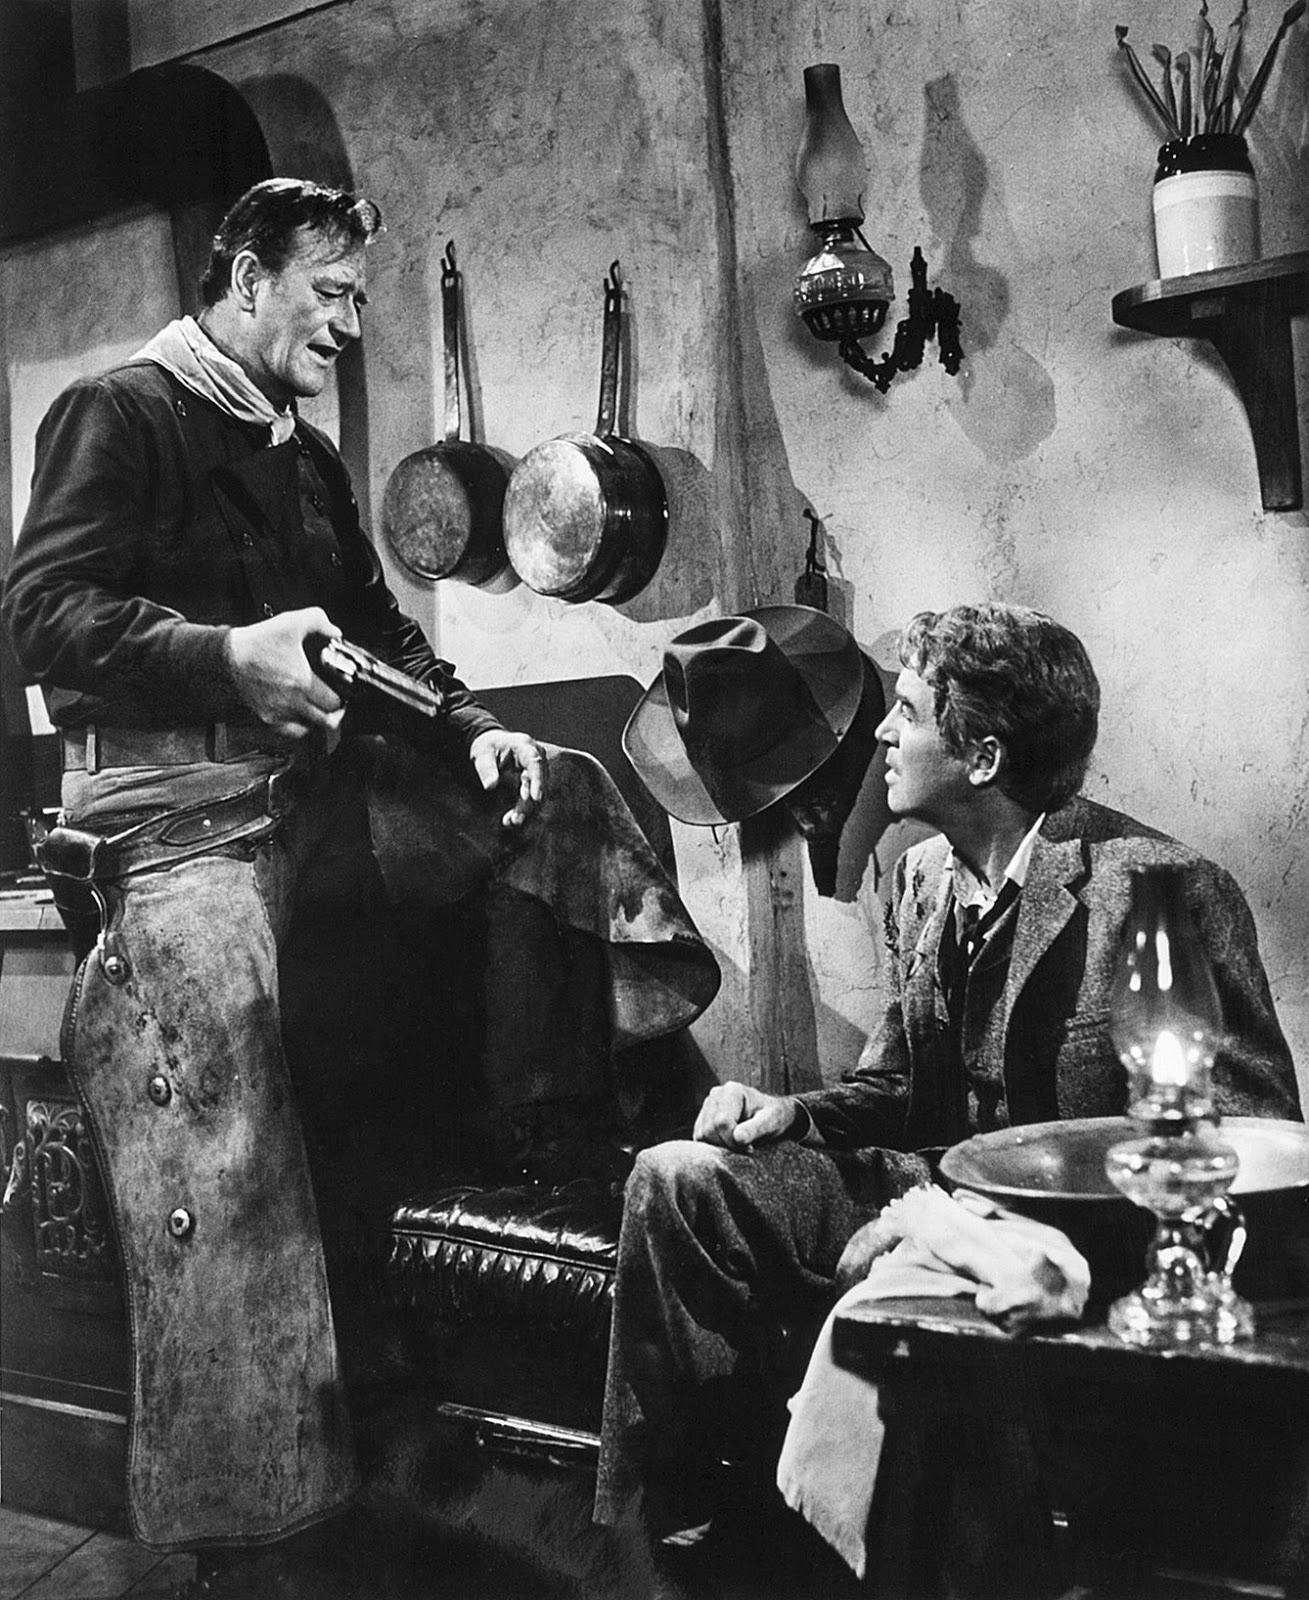 1001 Classic Movies: The Man Who Shot Liberty Valance